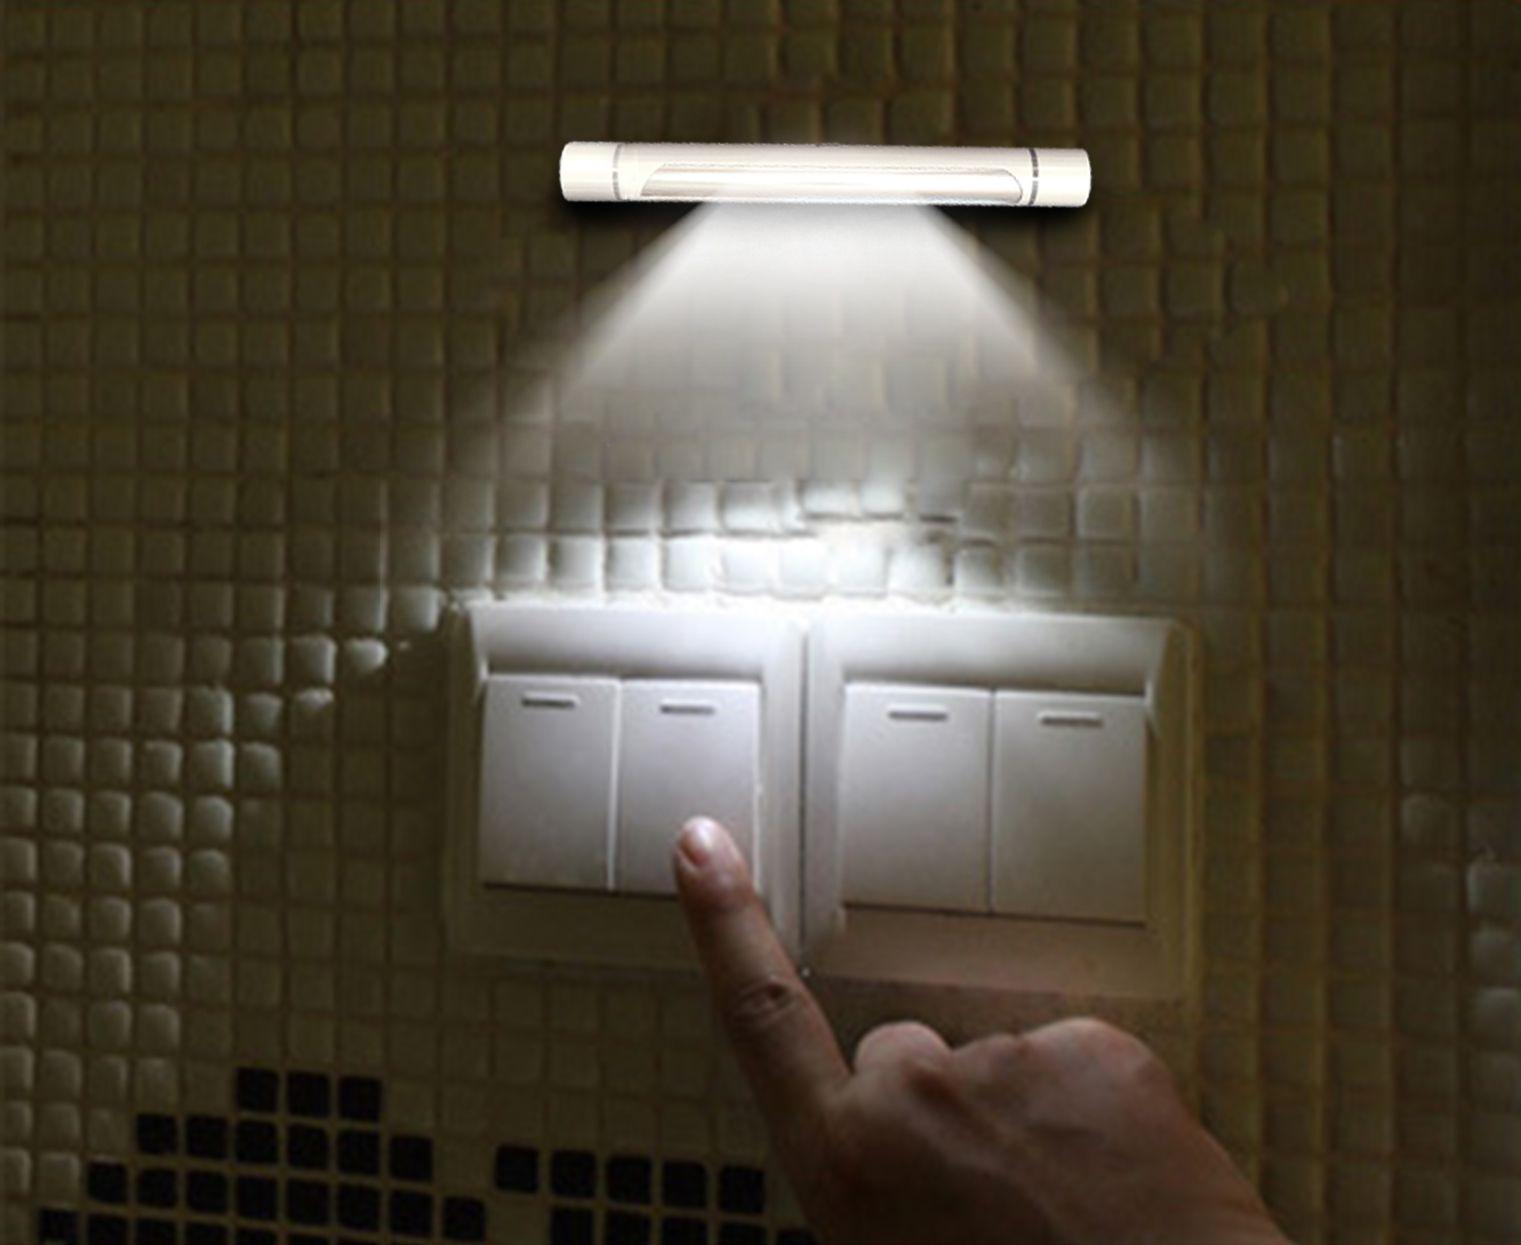 Best New Led Human Motion Activated Pir Light Sensor Bathroom Toilet ...